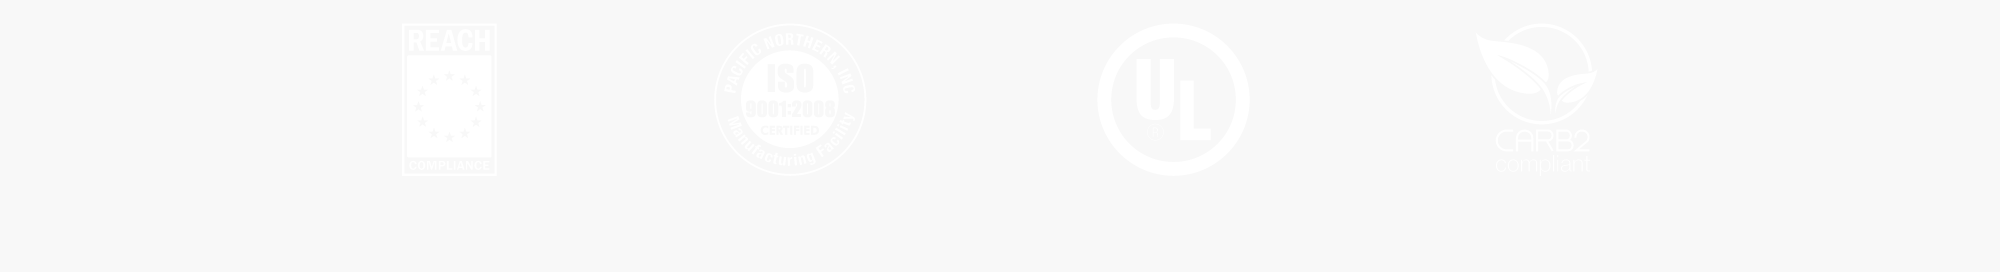 Cert-Comp_white-5